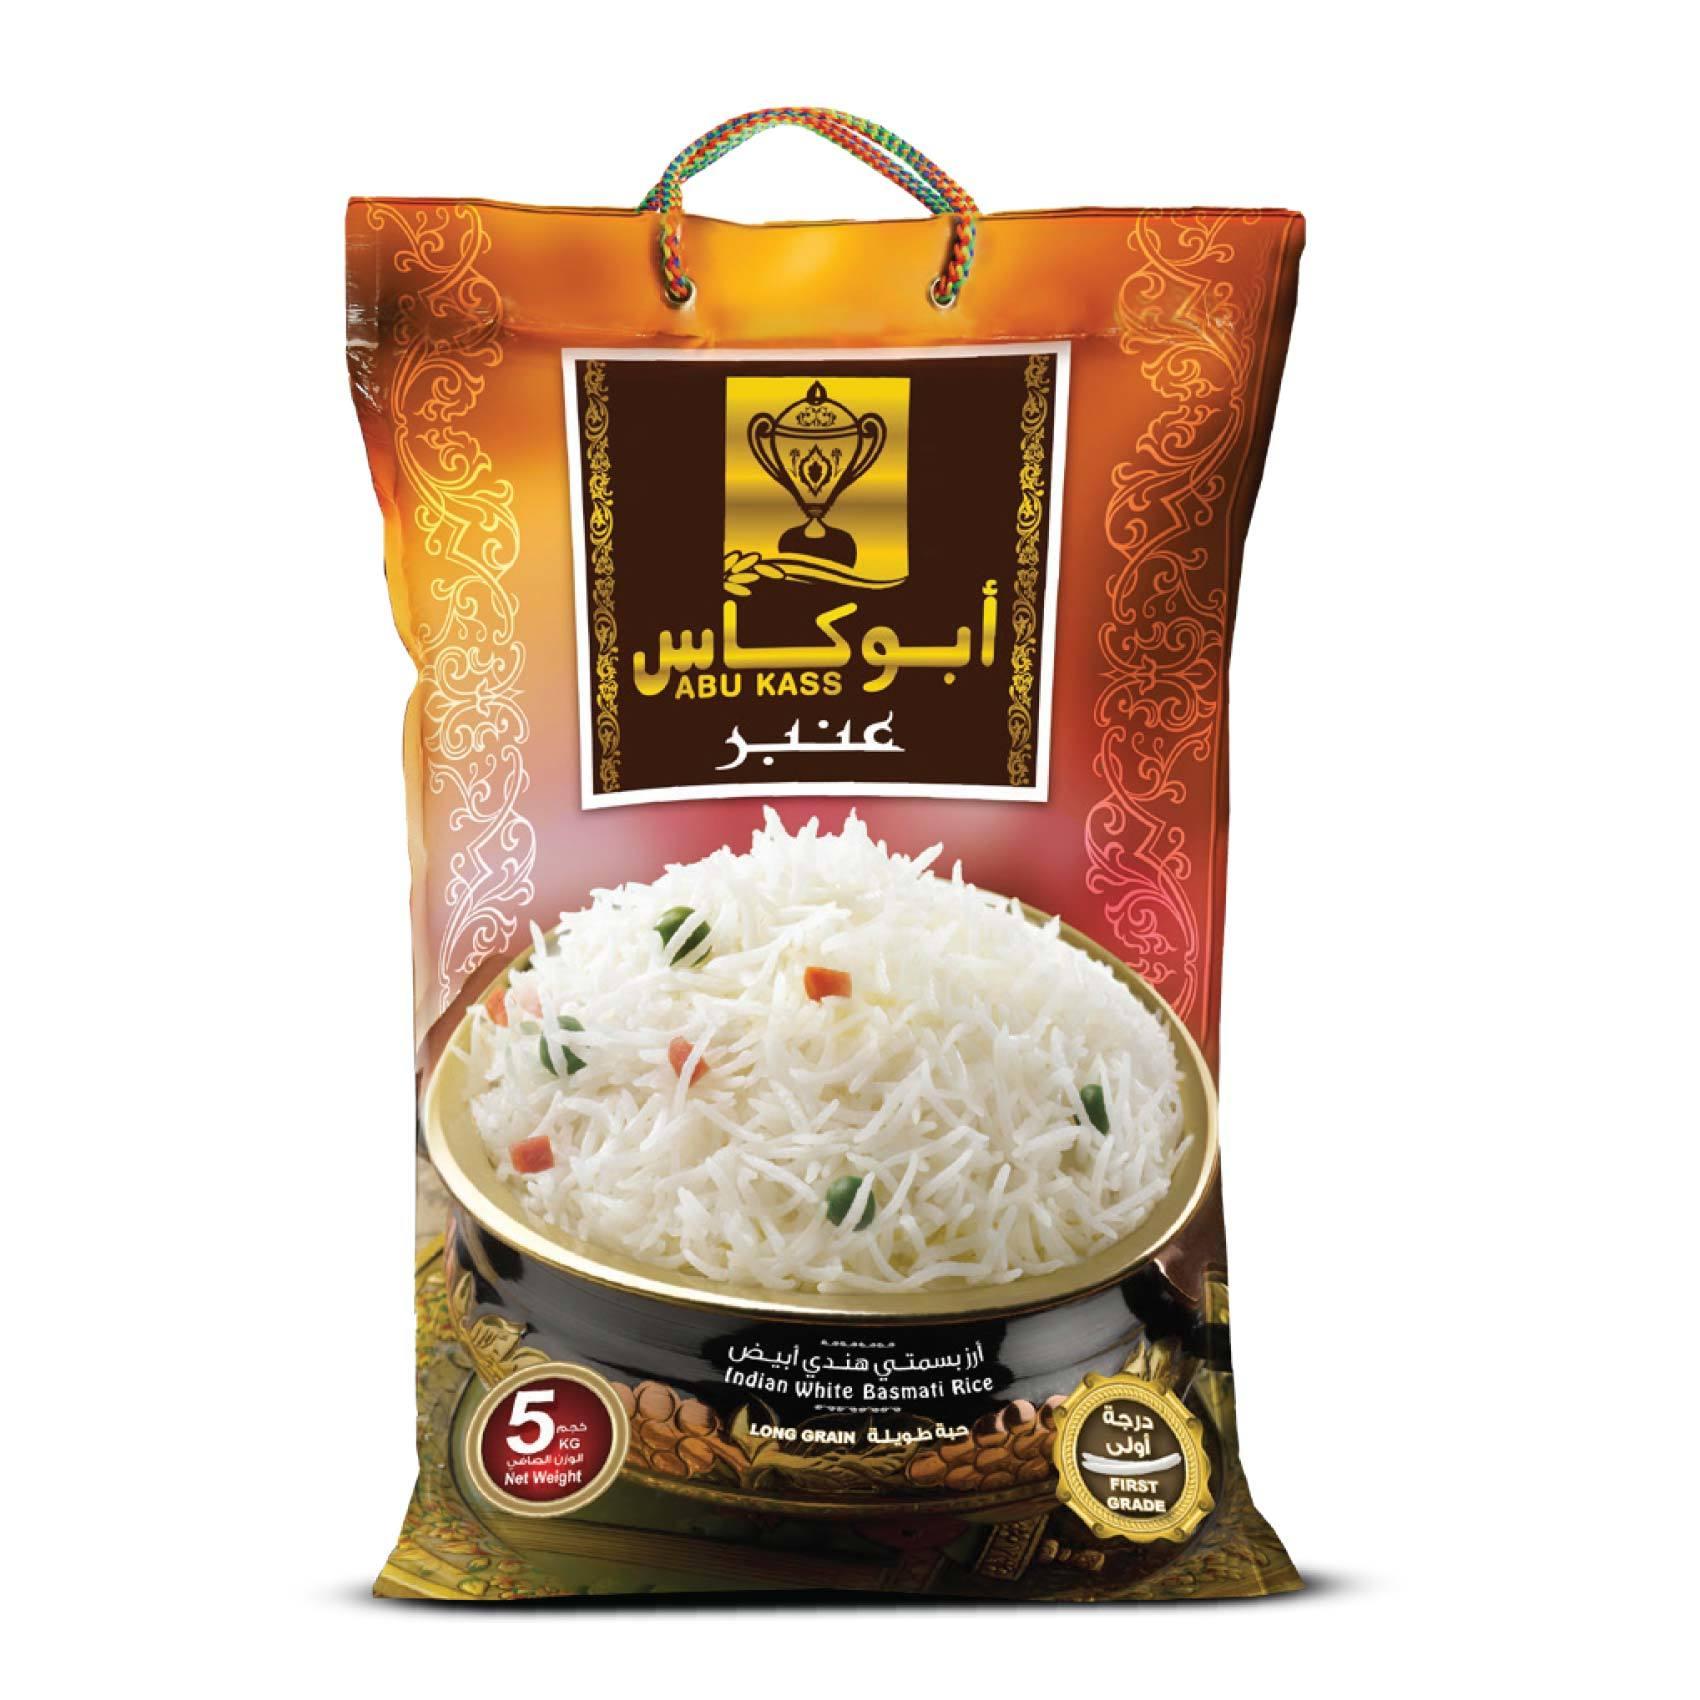 Buy Abukass Classic White Basmati Rice 5 Kg Online Shop Food Cupboard On Carrefour Saudi Arabia